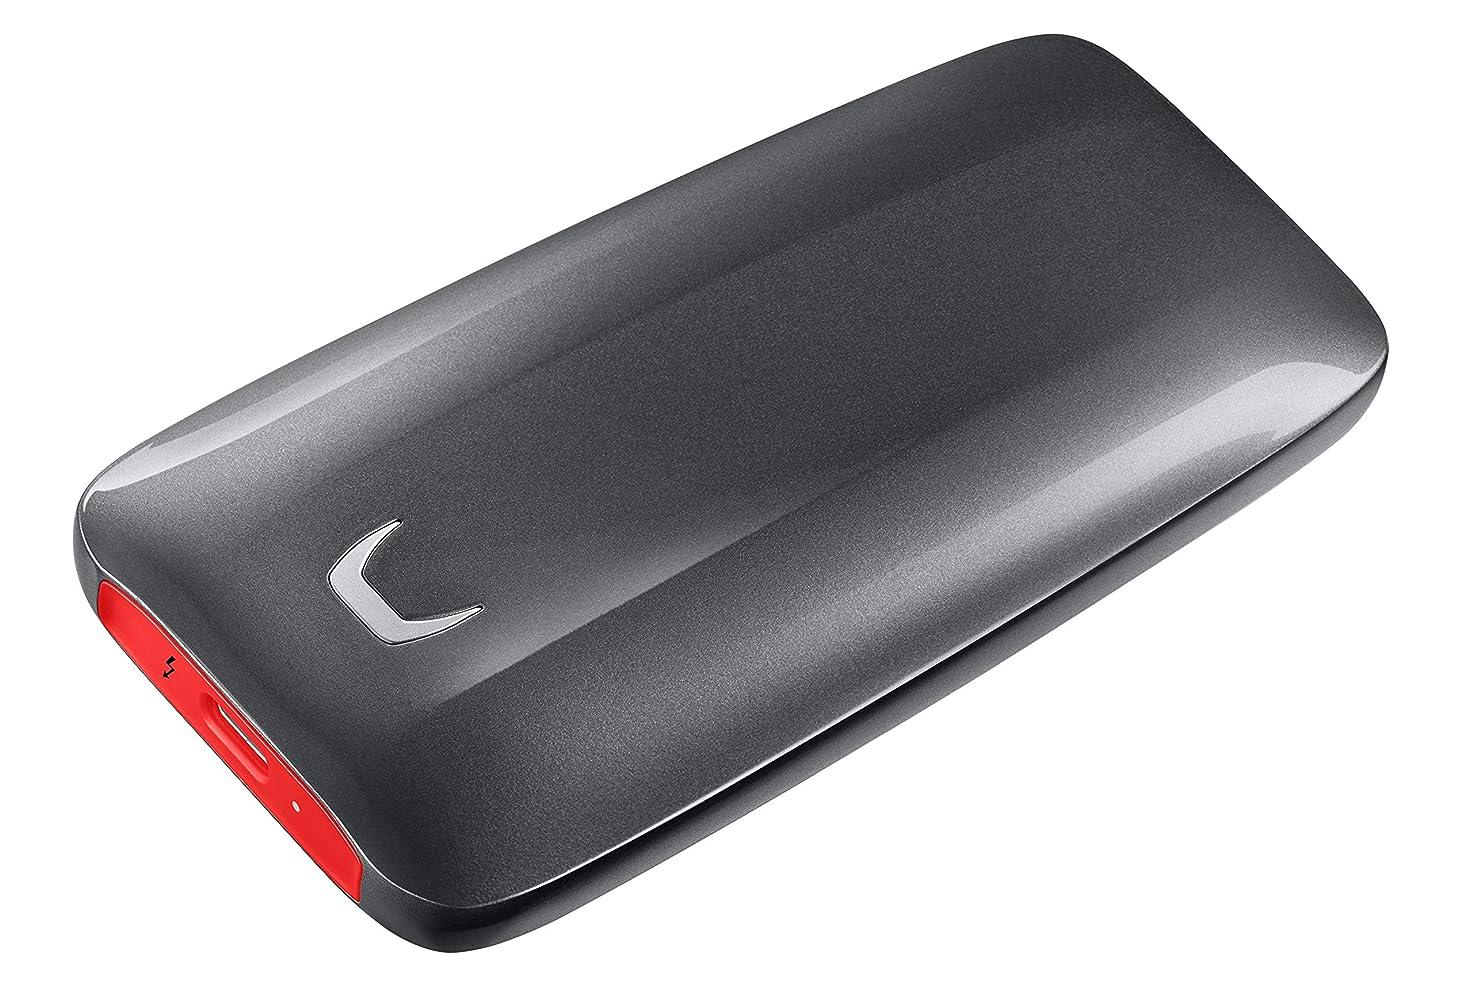 Samsung X5 Portable SSD - 500GB - Thunderbolt 3 External SSD (MU-PB500B/AM) Gray/Red awcjn75300